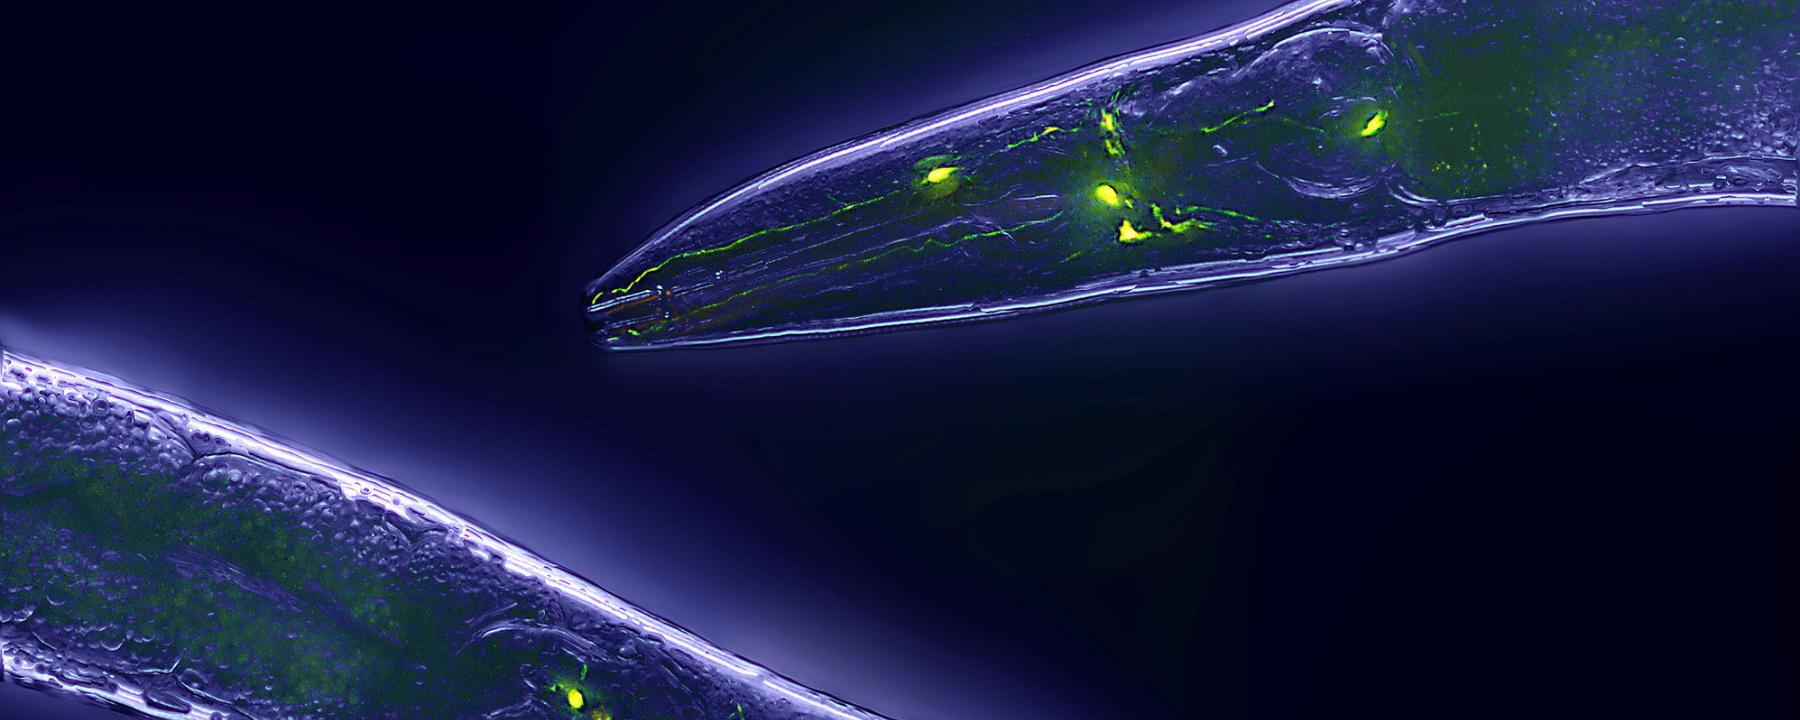 <em>C. elegans&nbsp;</em>Healthier Without Longevity Gene